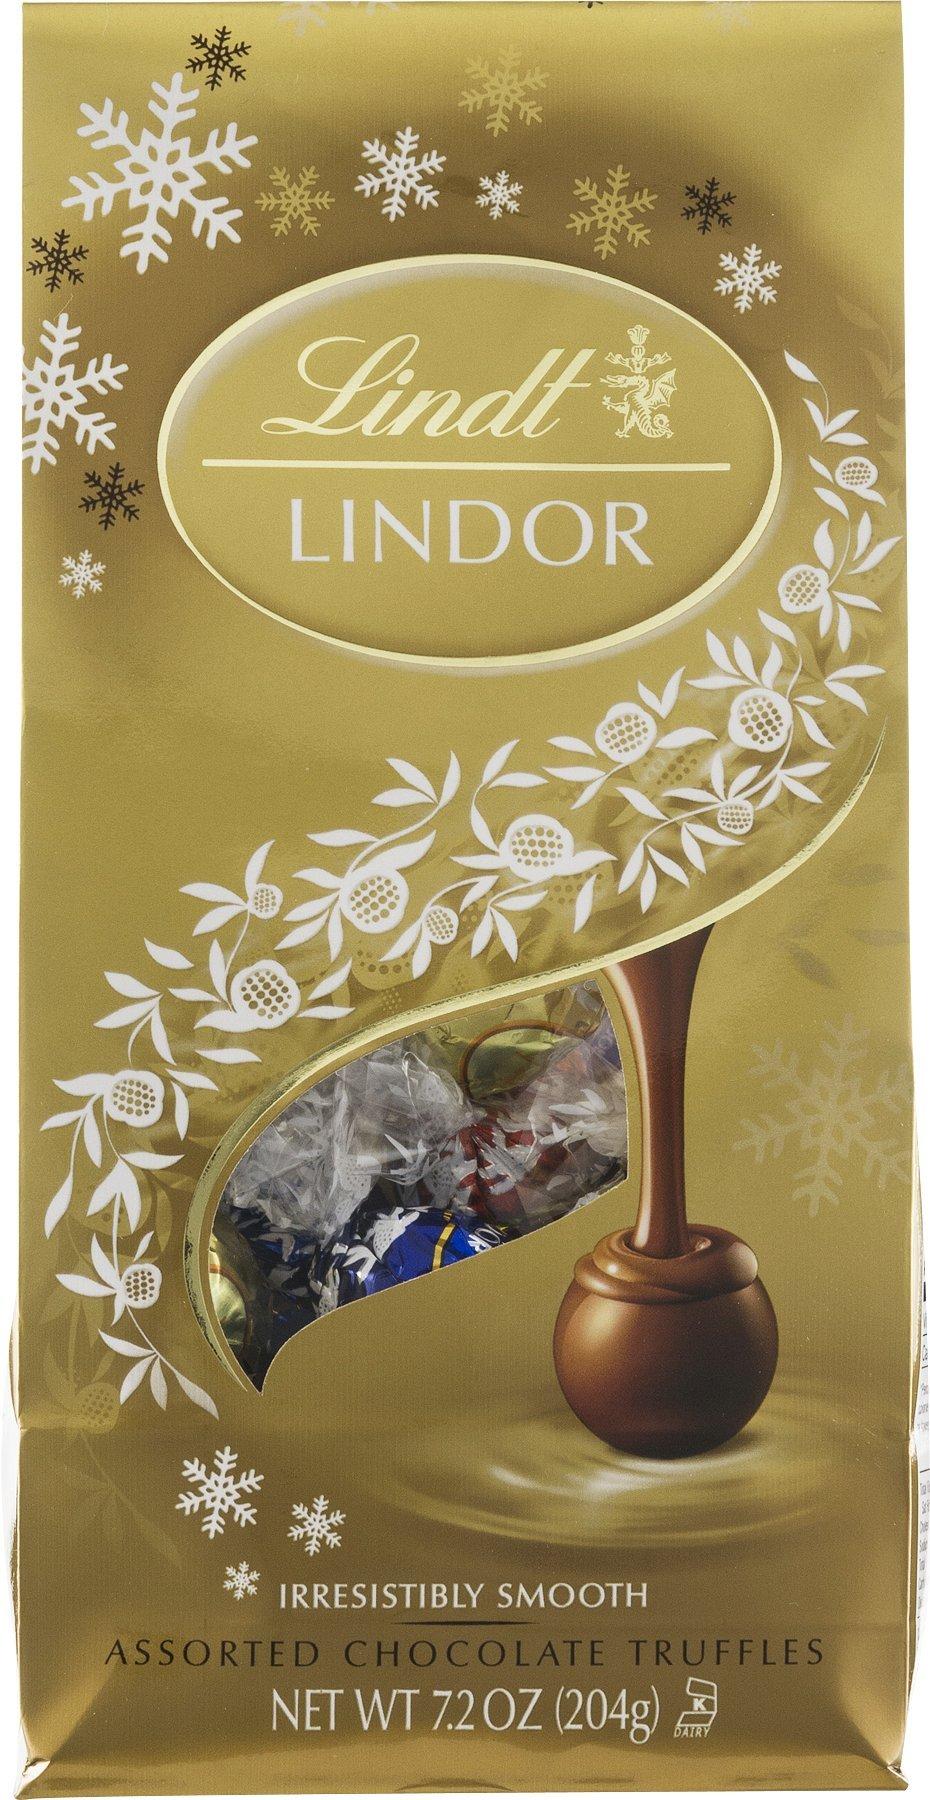 Lindt Lindor Assorted Chocolate Truffles 5.1 Oz, Pack of 1